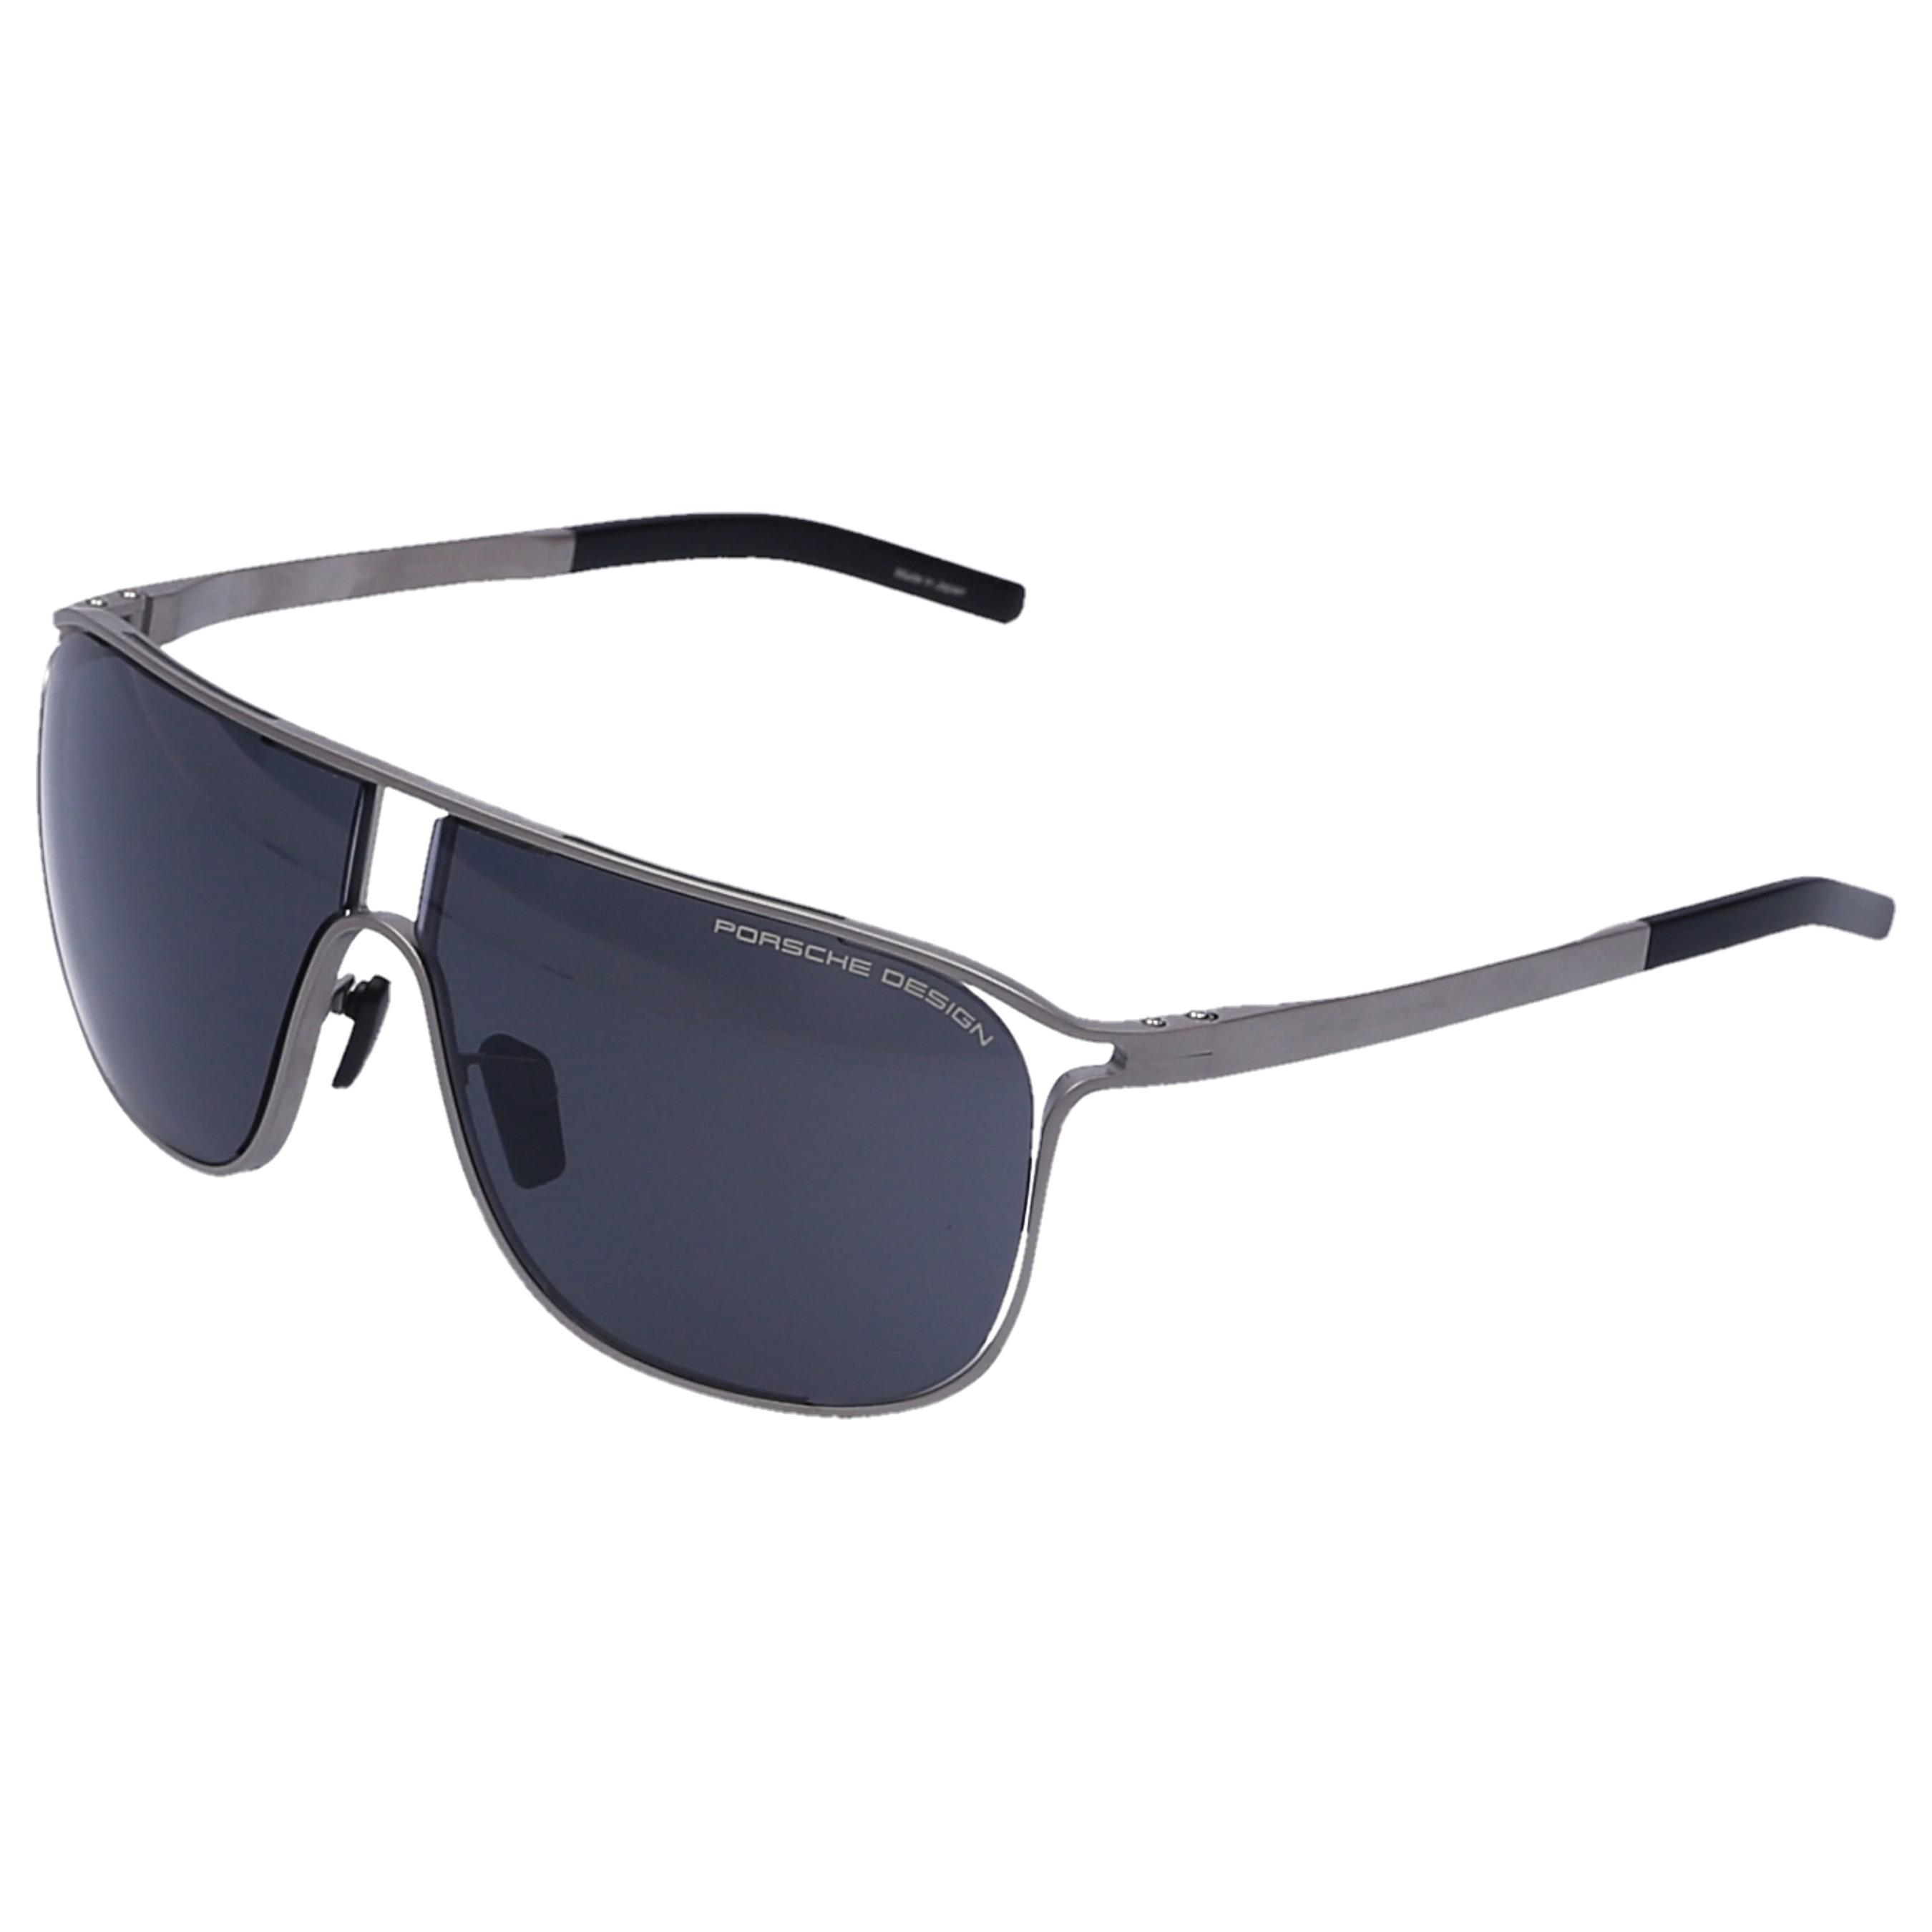 4f14b6fb74 Lyst - Porsche Design Men Sunglasses Aviator 8663 Titanium Silver in ...